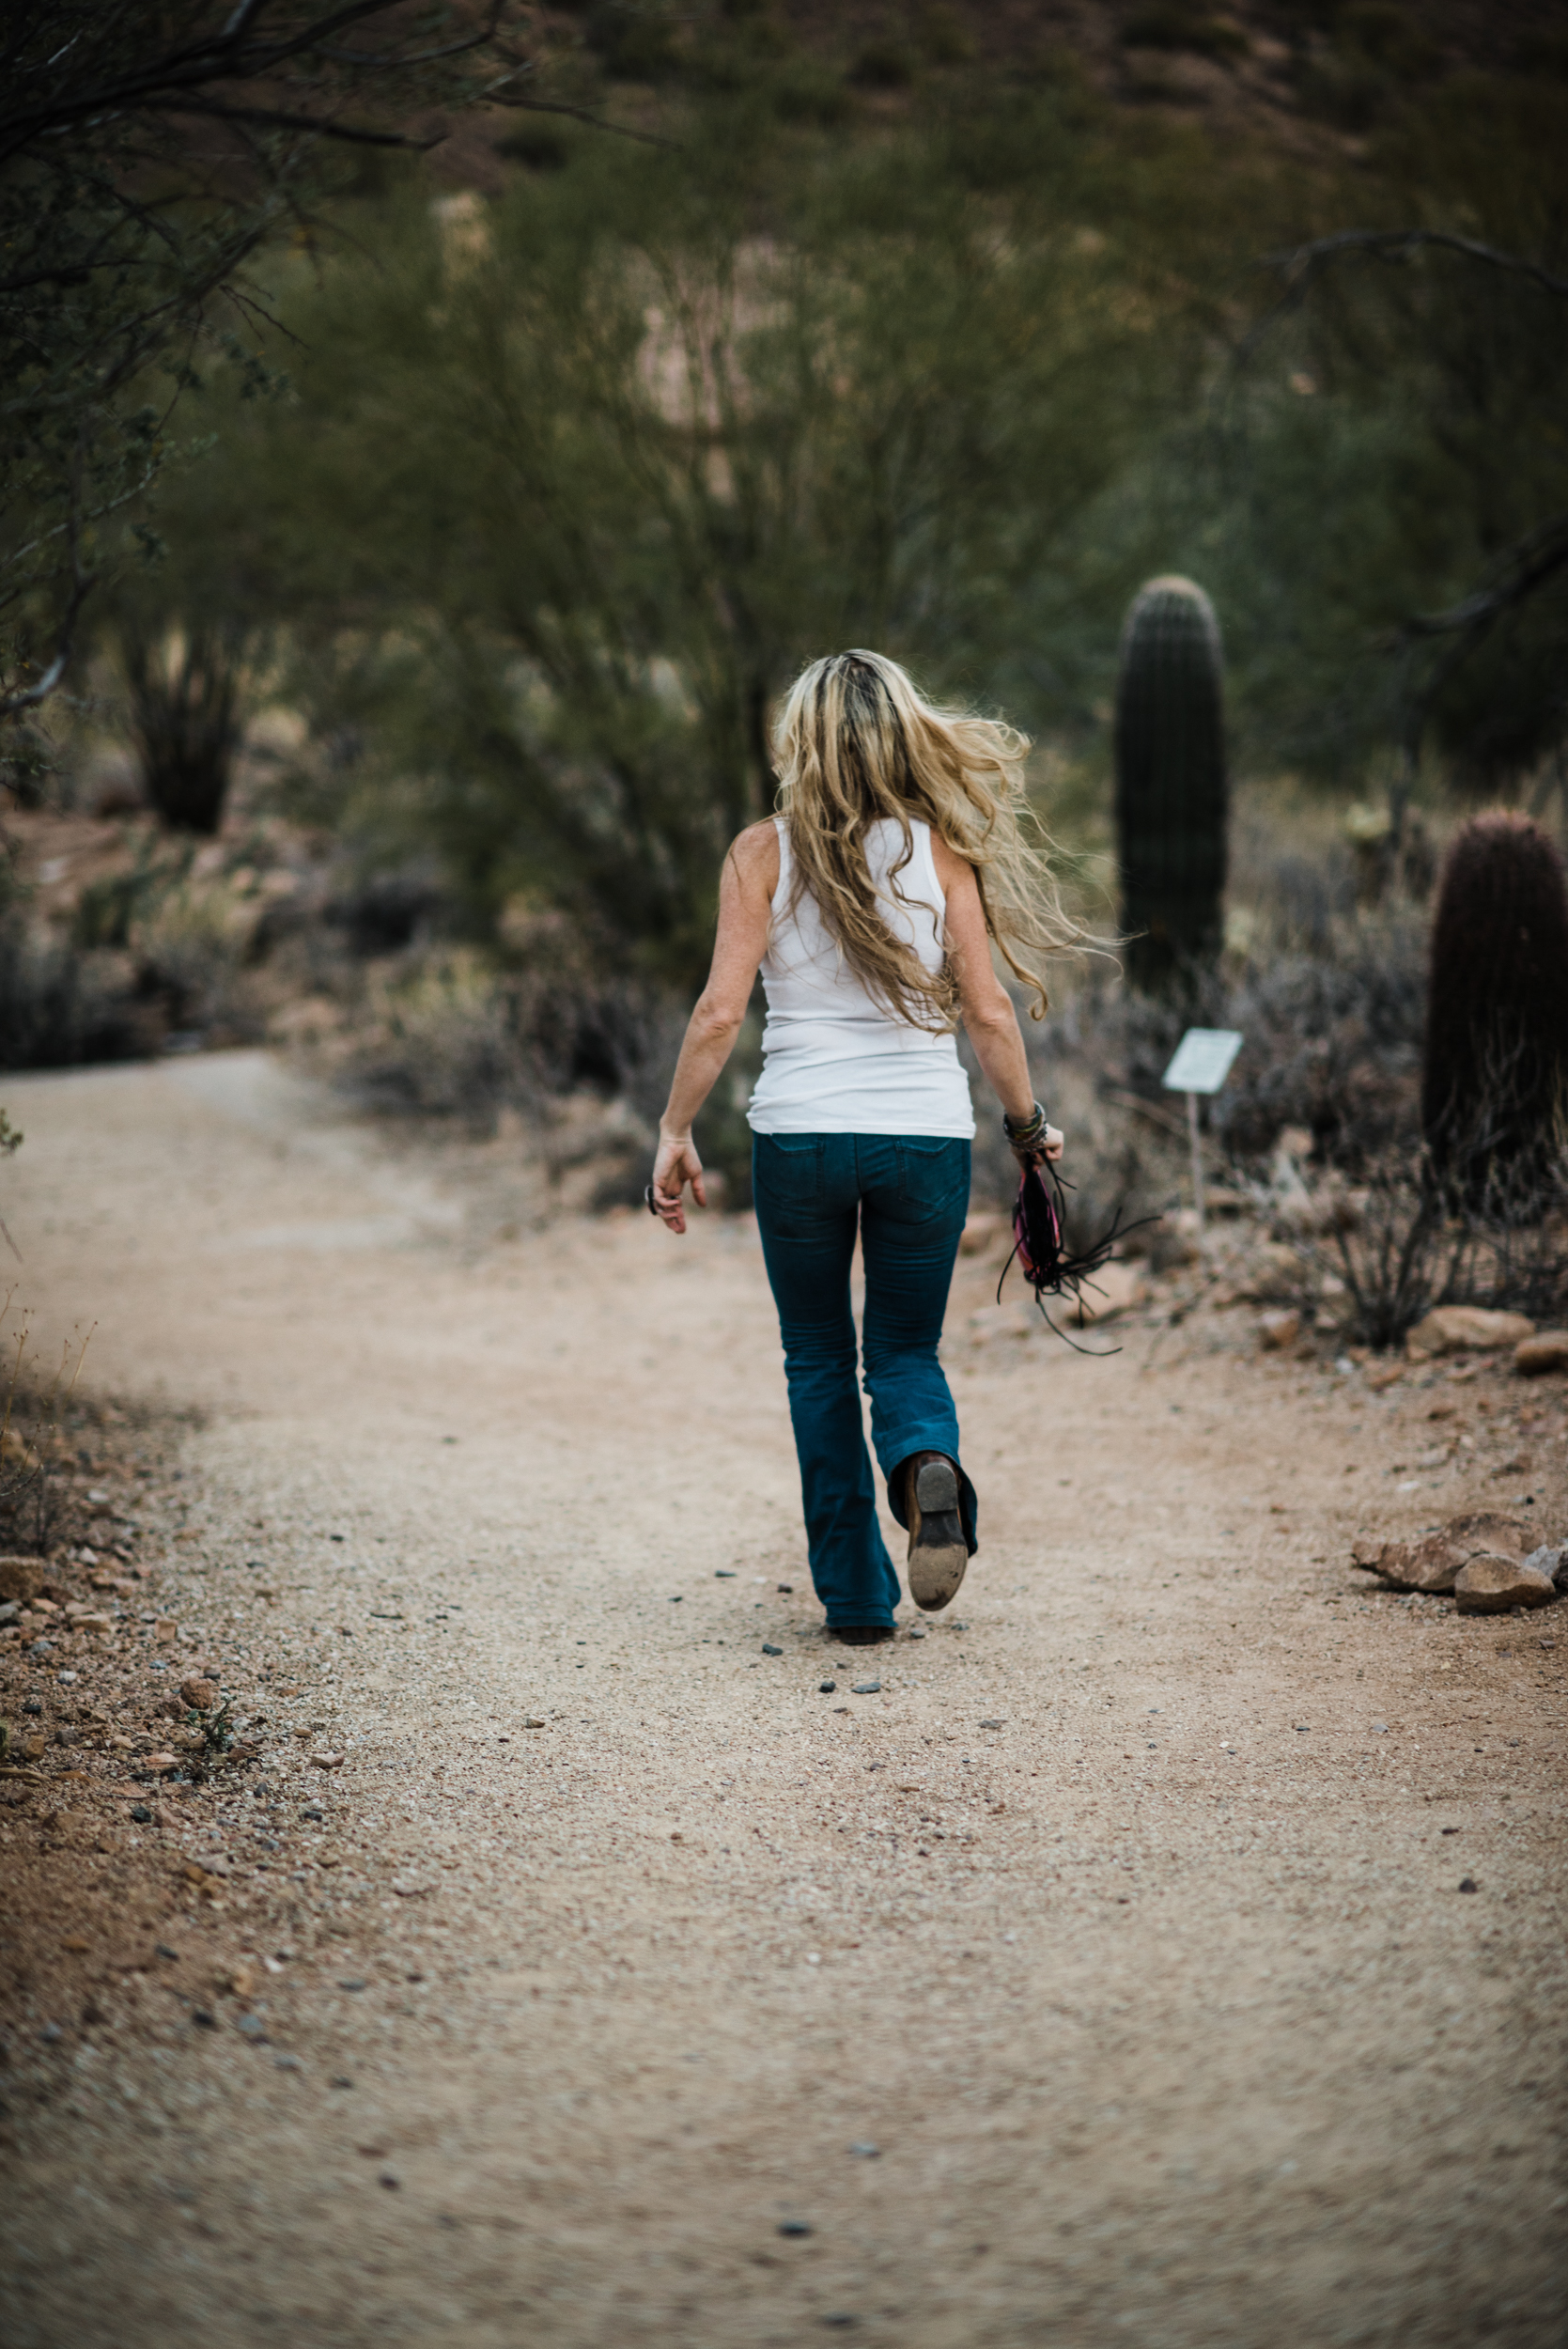 Arizona-love-hippie-momma-bags-boho-21.jpg